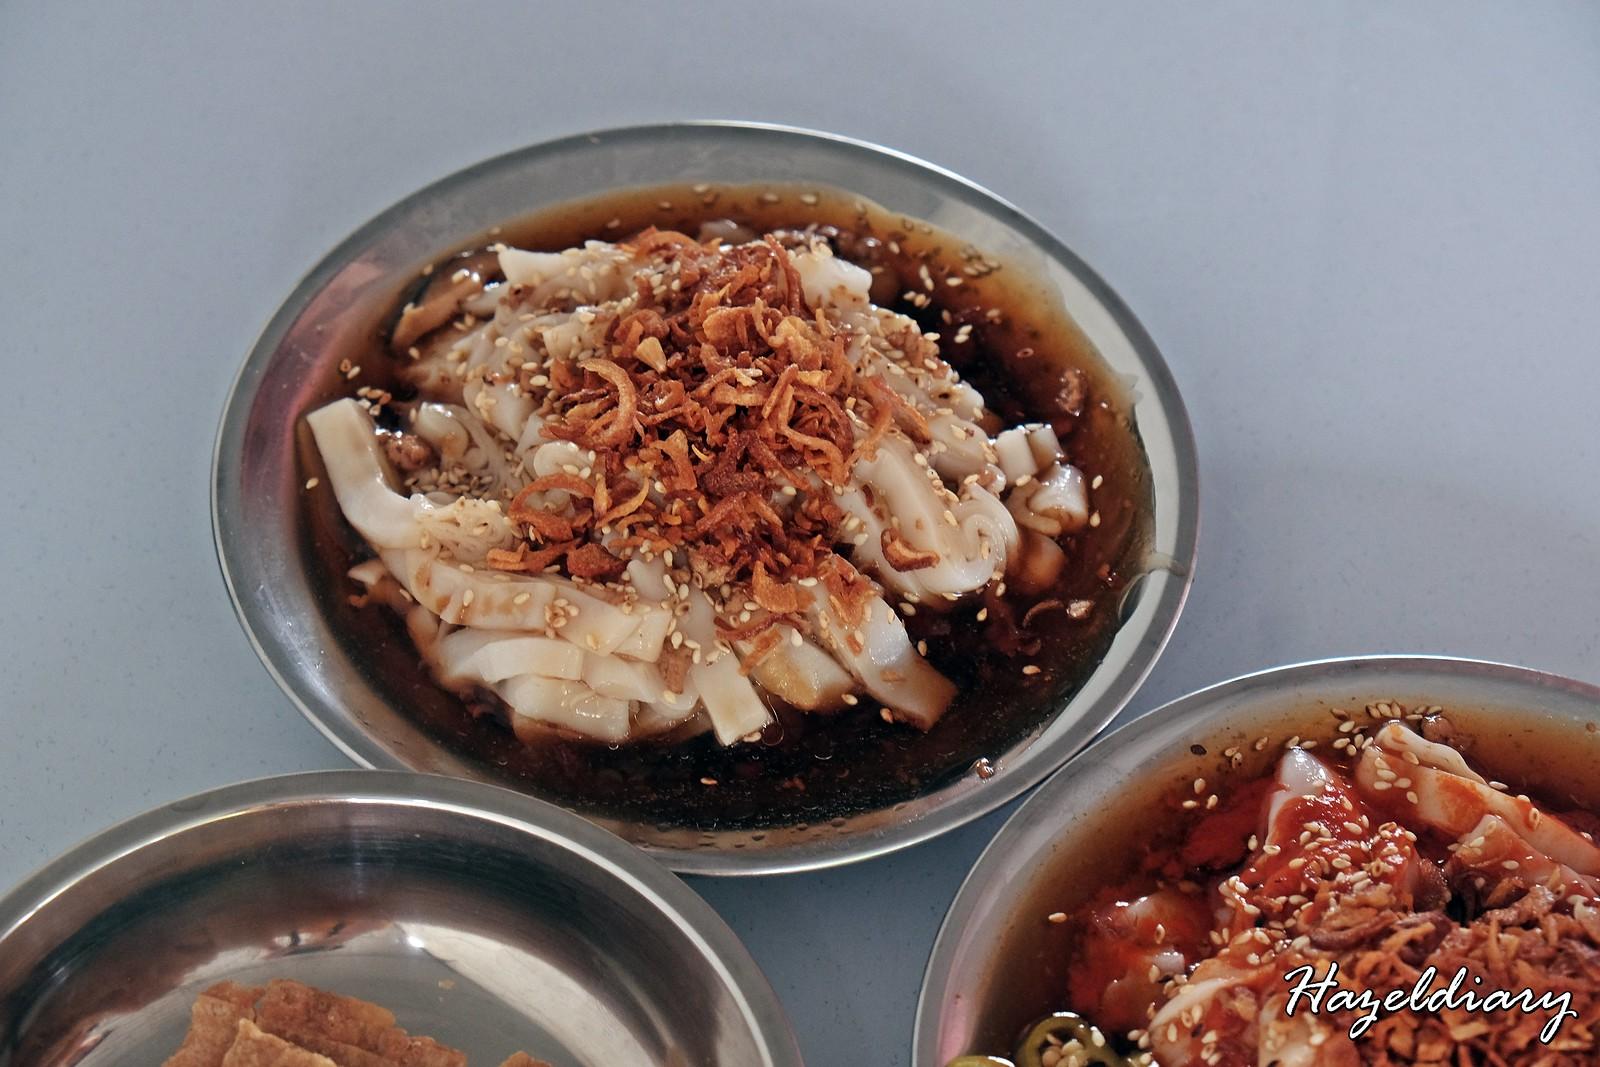 Canning Garden Ipoh-Cheong Fun-Mushroom